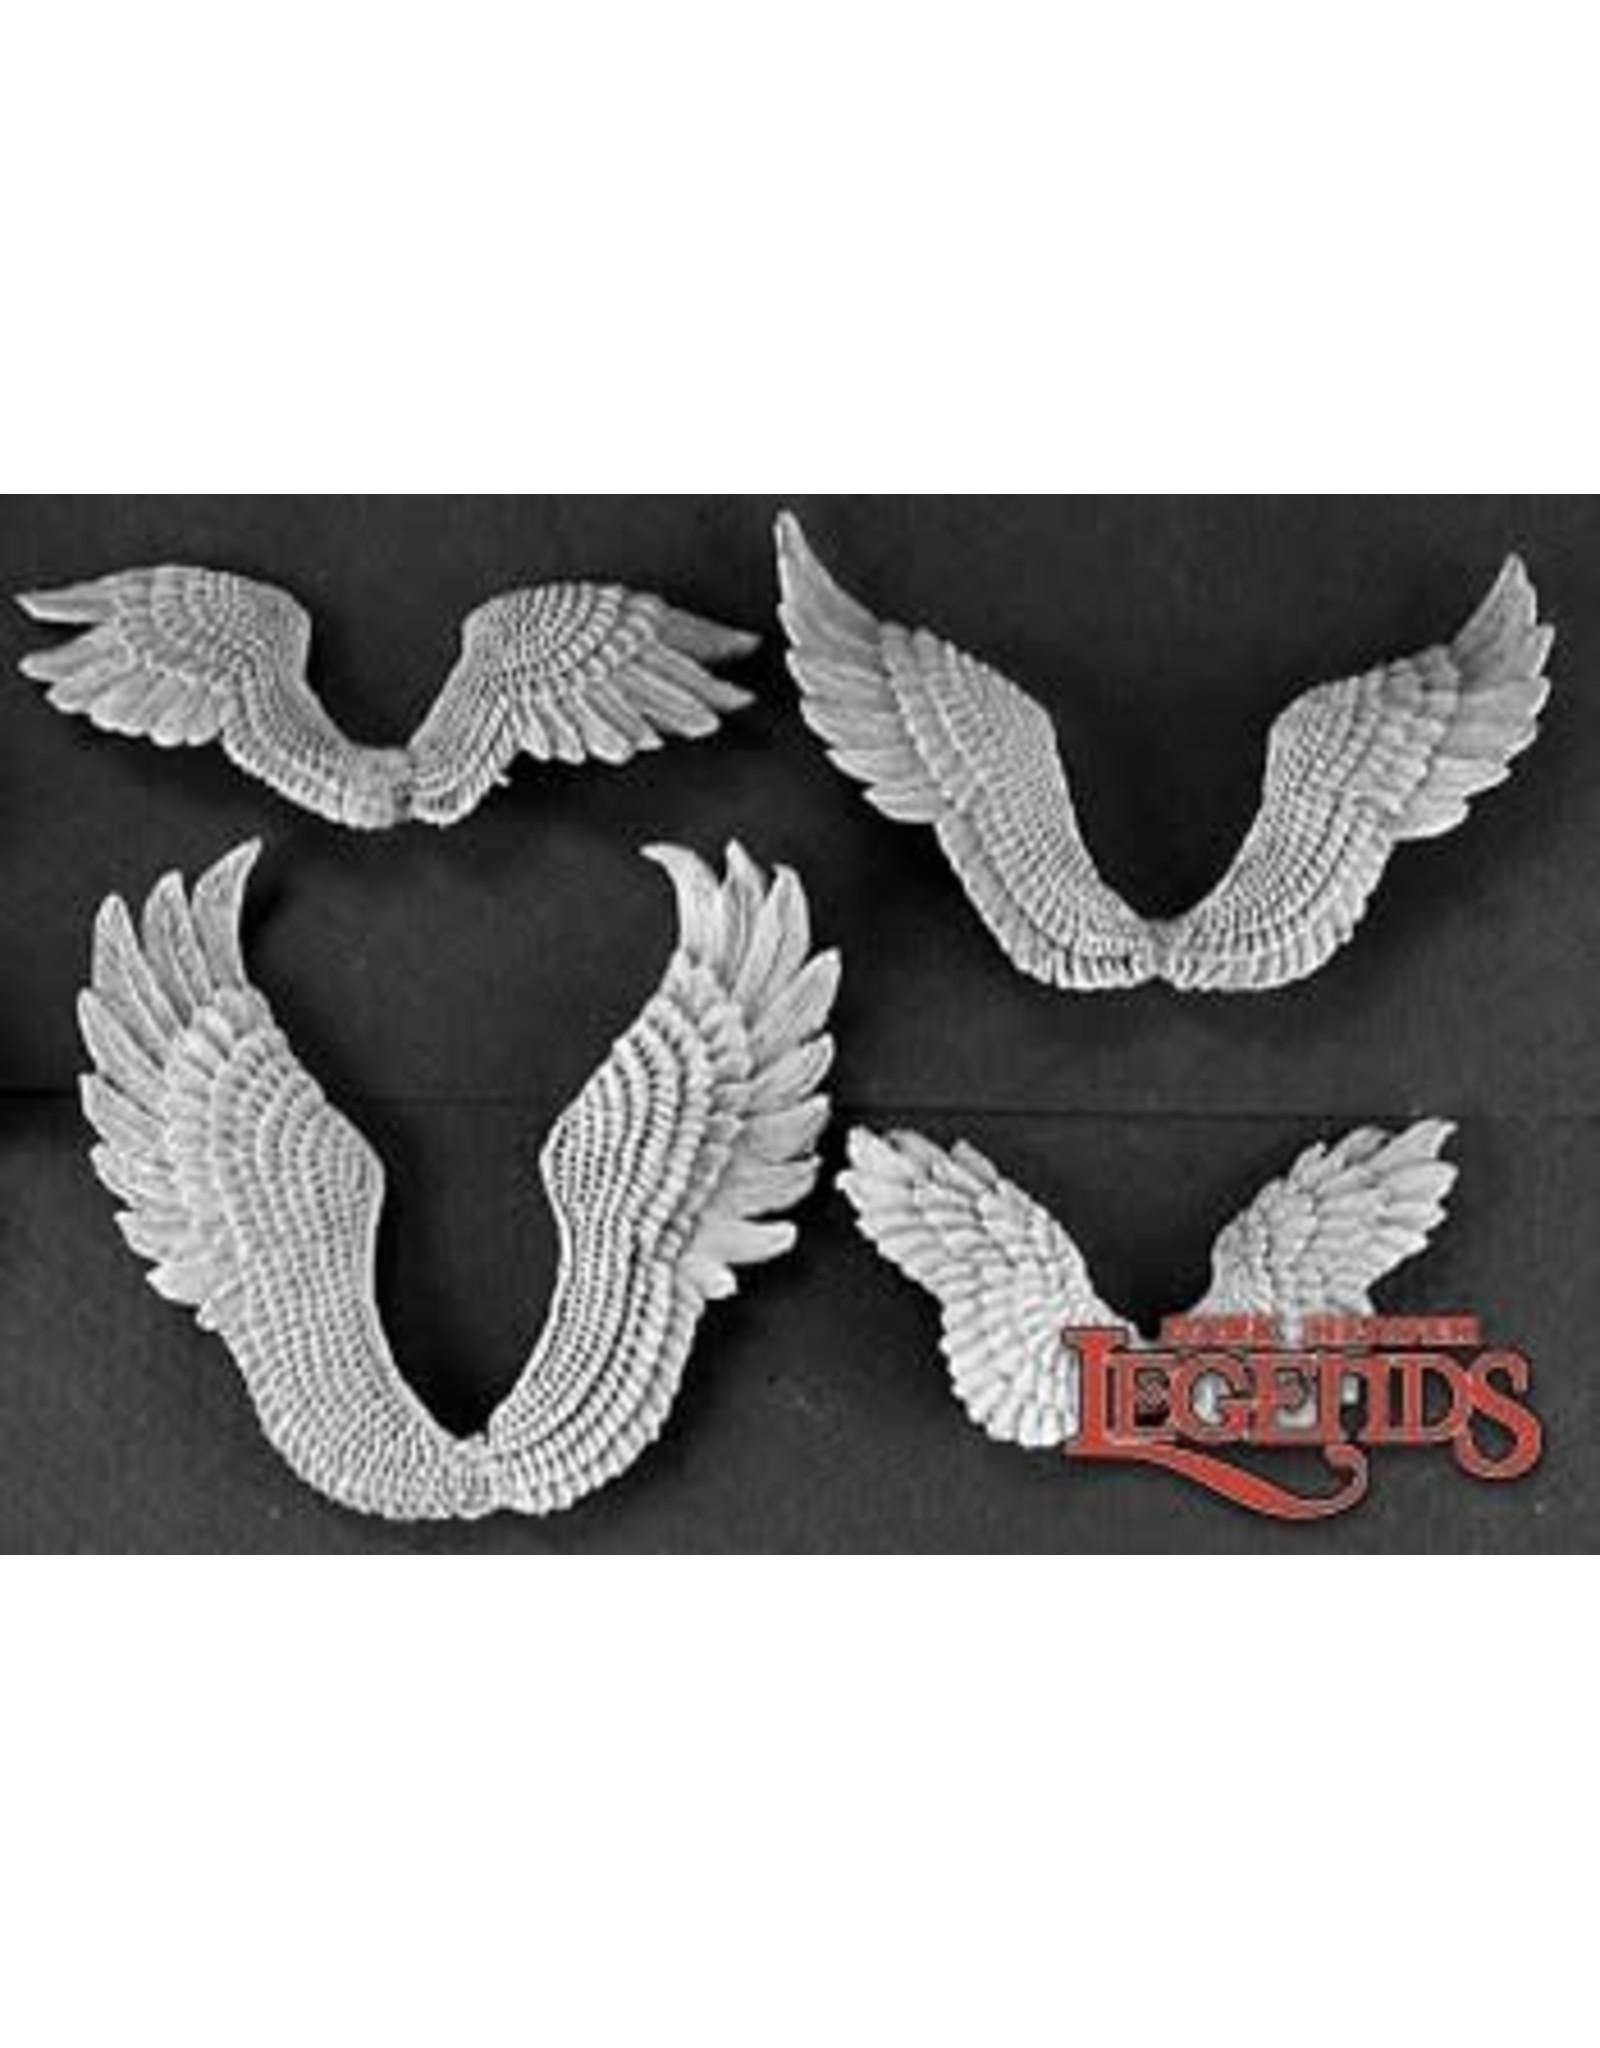 Reaper Miniatures Angelic Wings (4)